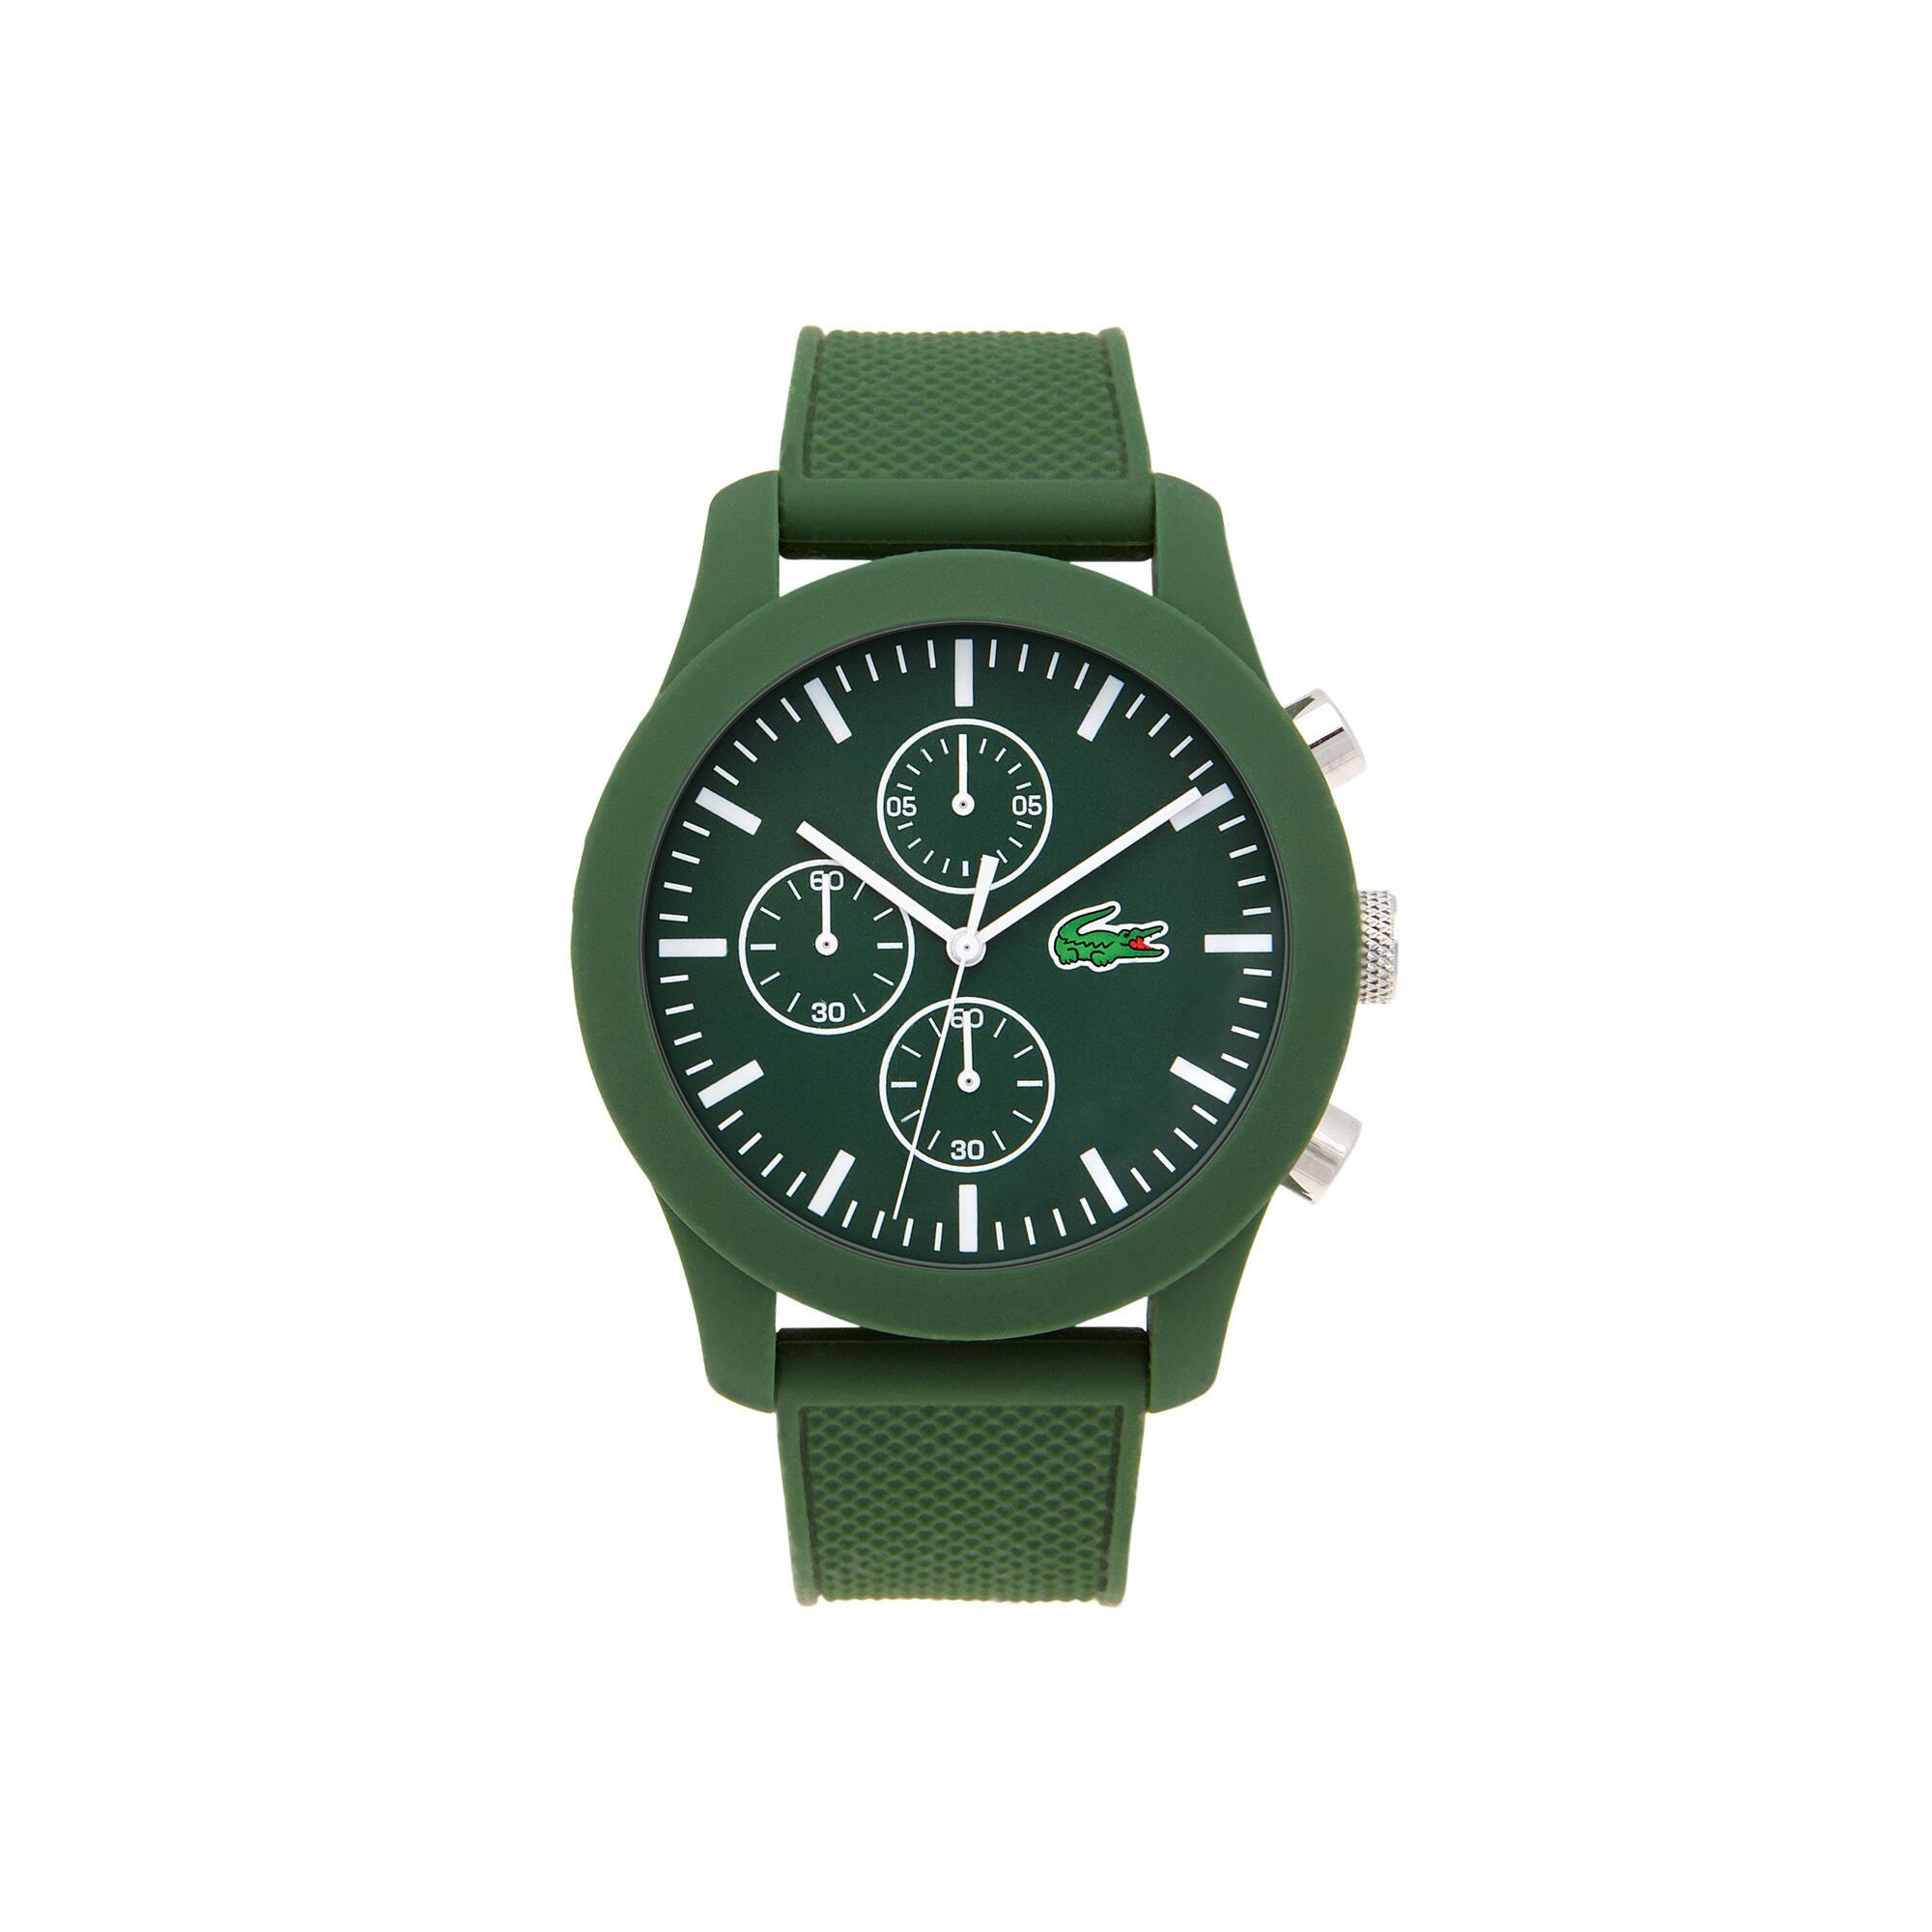 Montre Lacoste.12.12 chronographe verte en silicone